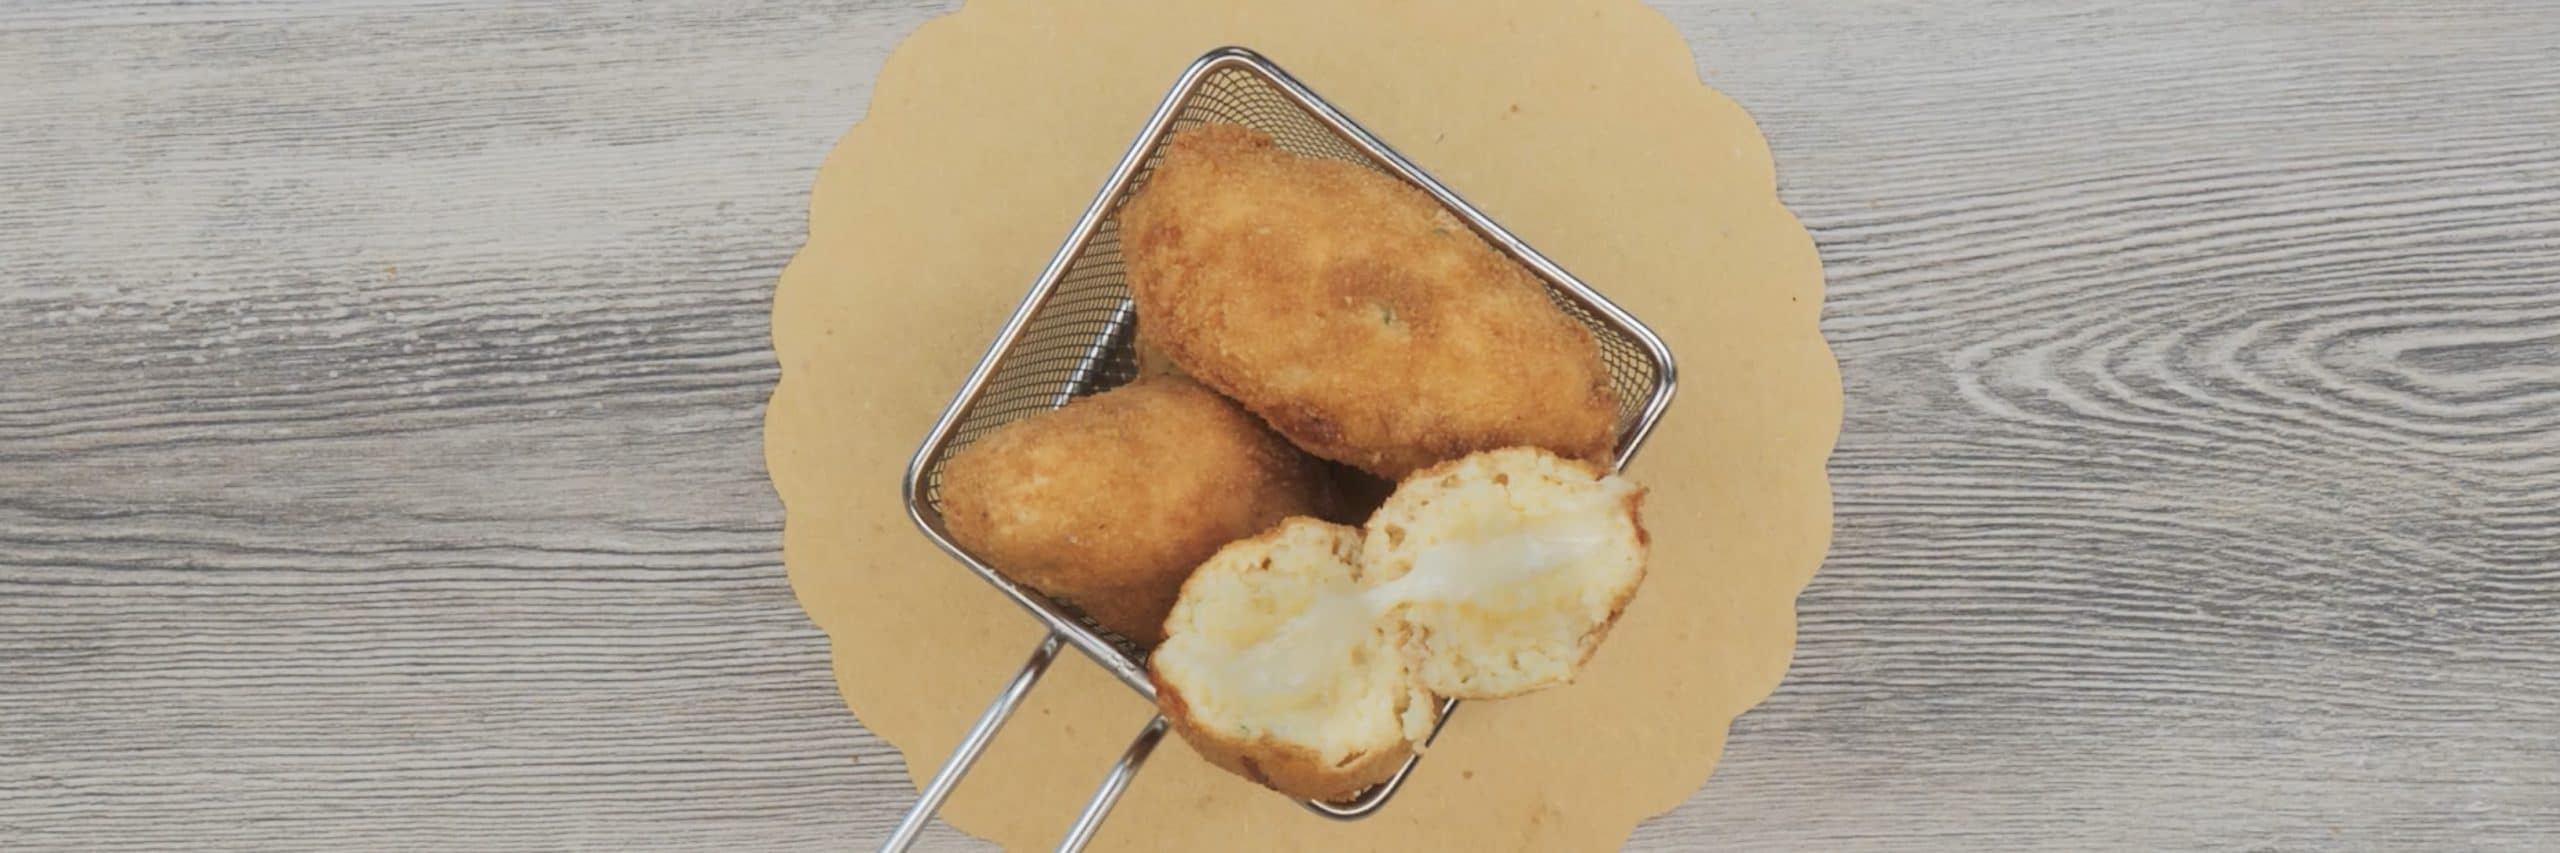 Crocchè di patate - Ricette Selenella